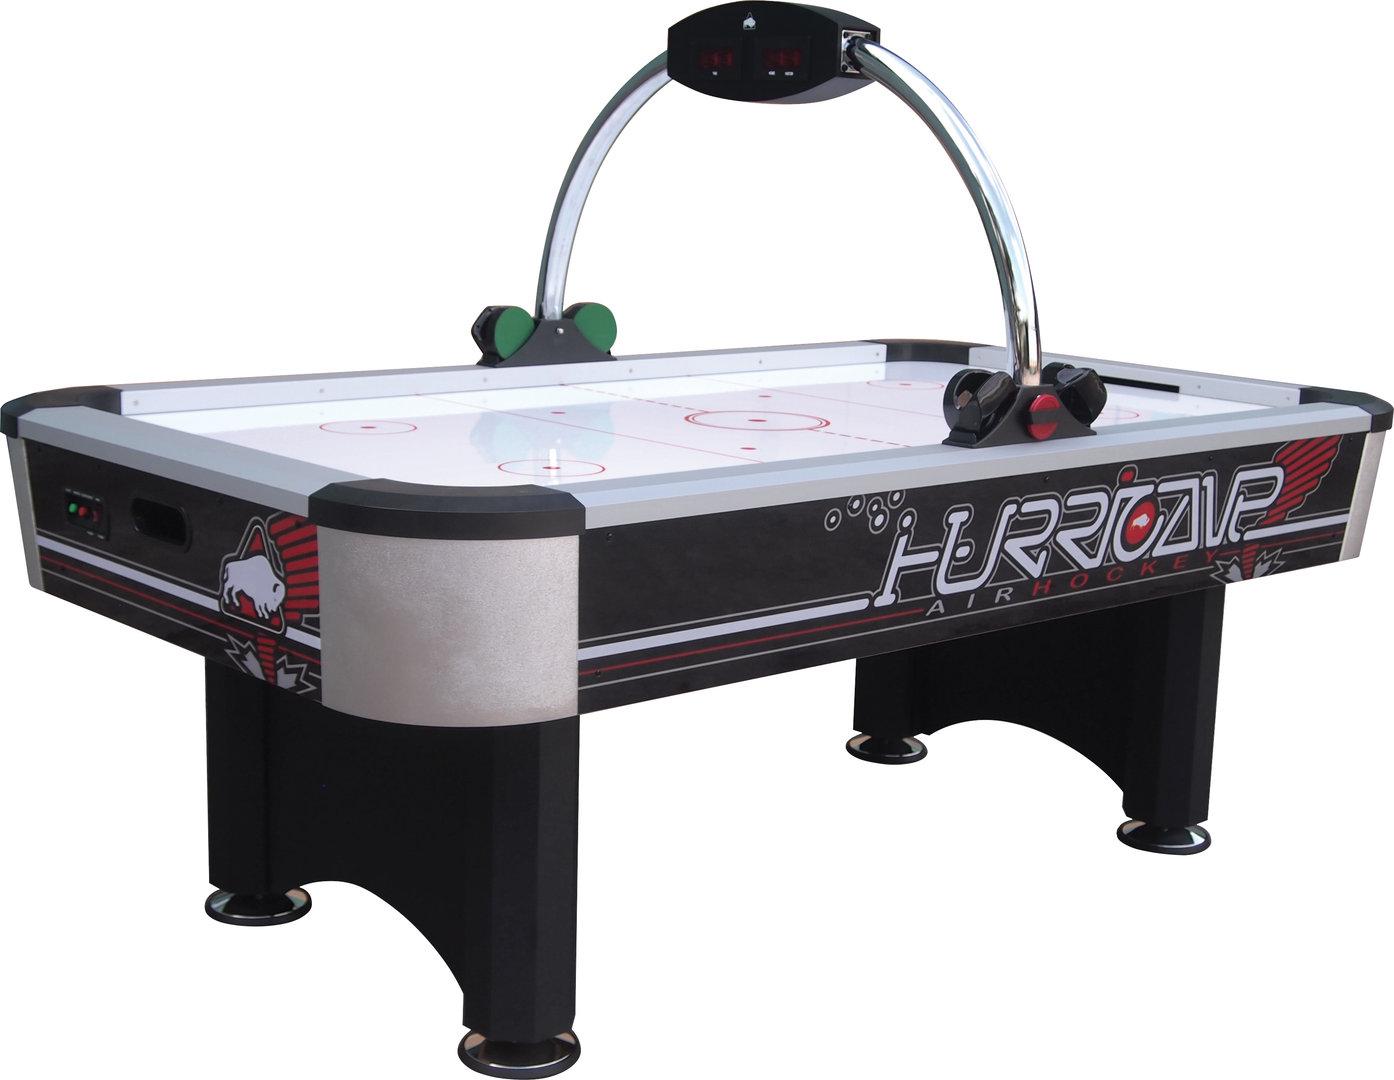 bufffalo hurricane 2 air hockey airhockey tisch kauf kickerkult. Black Bedroom Furniture Sets. Home Design Ideas